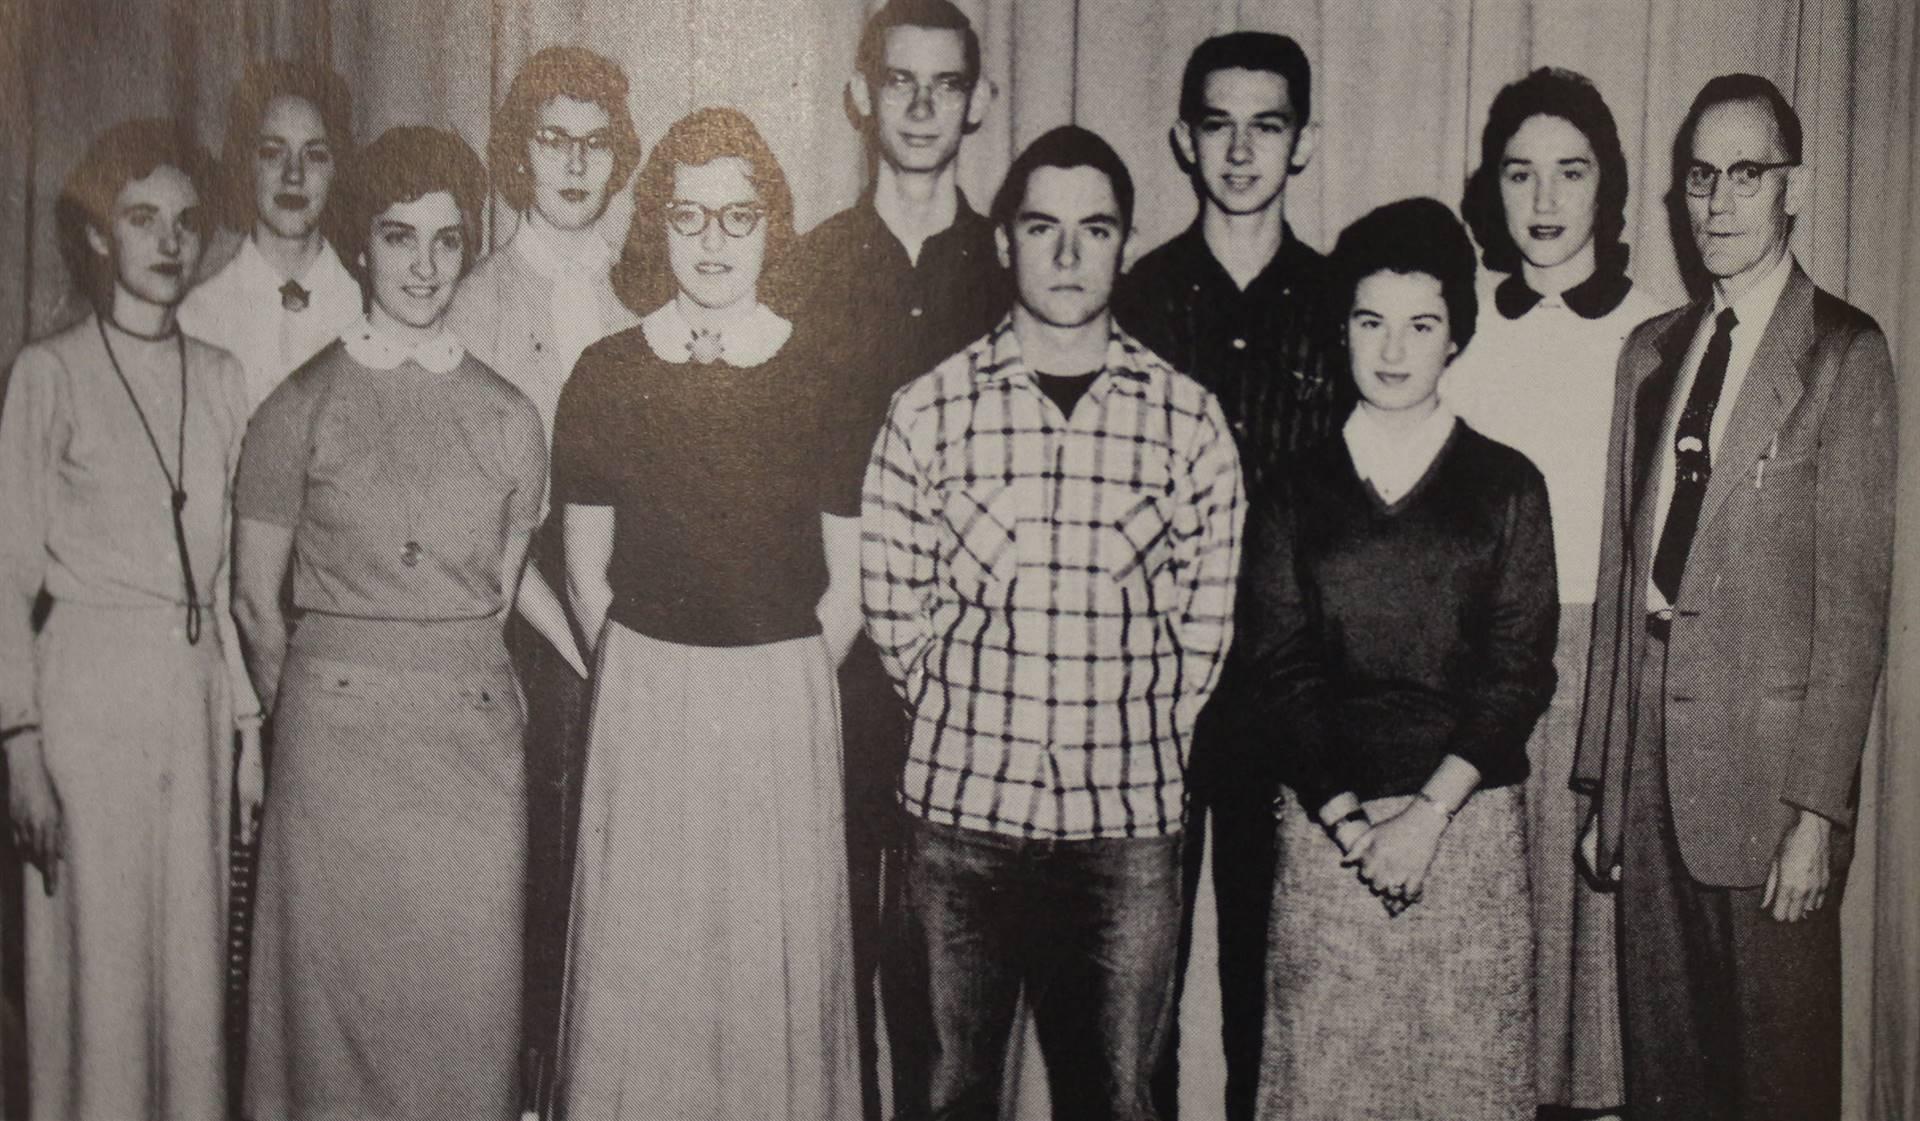 1957 Honorary Club